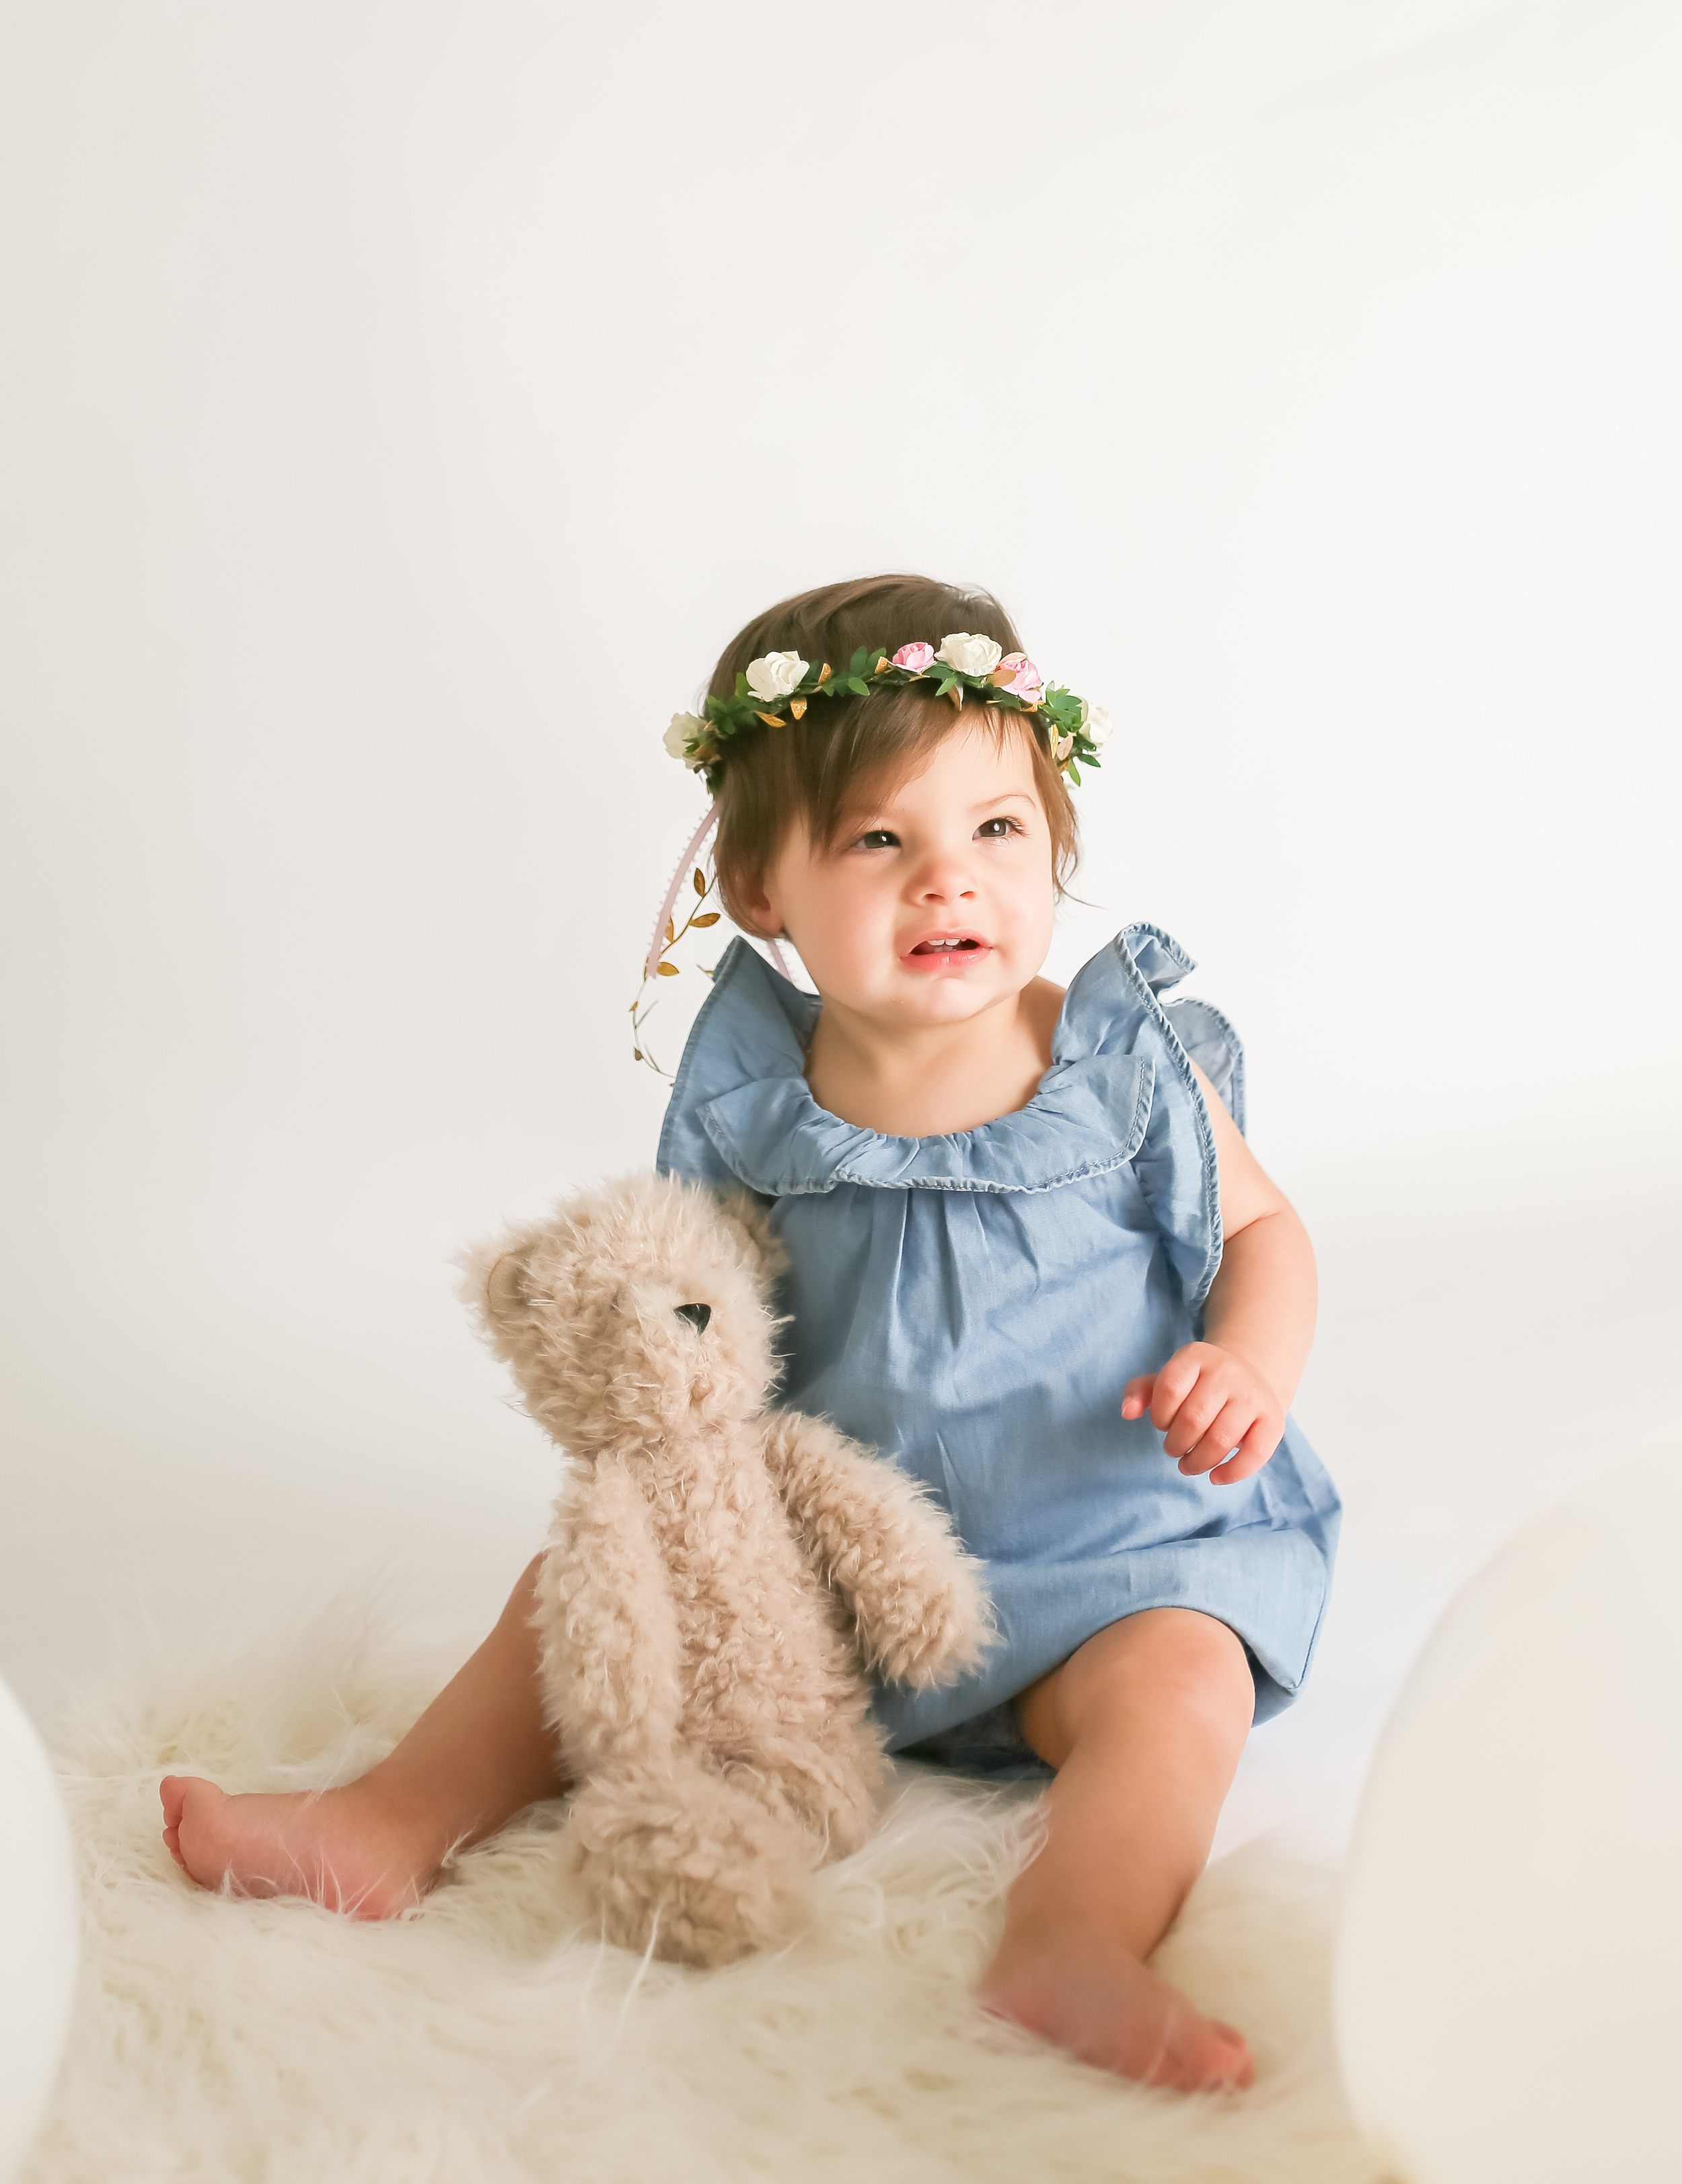 baby girl teddy bear balloon